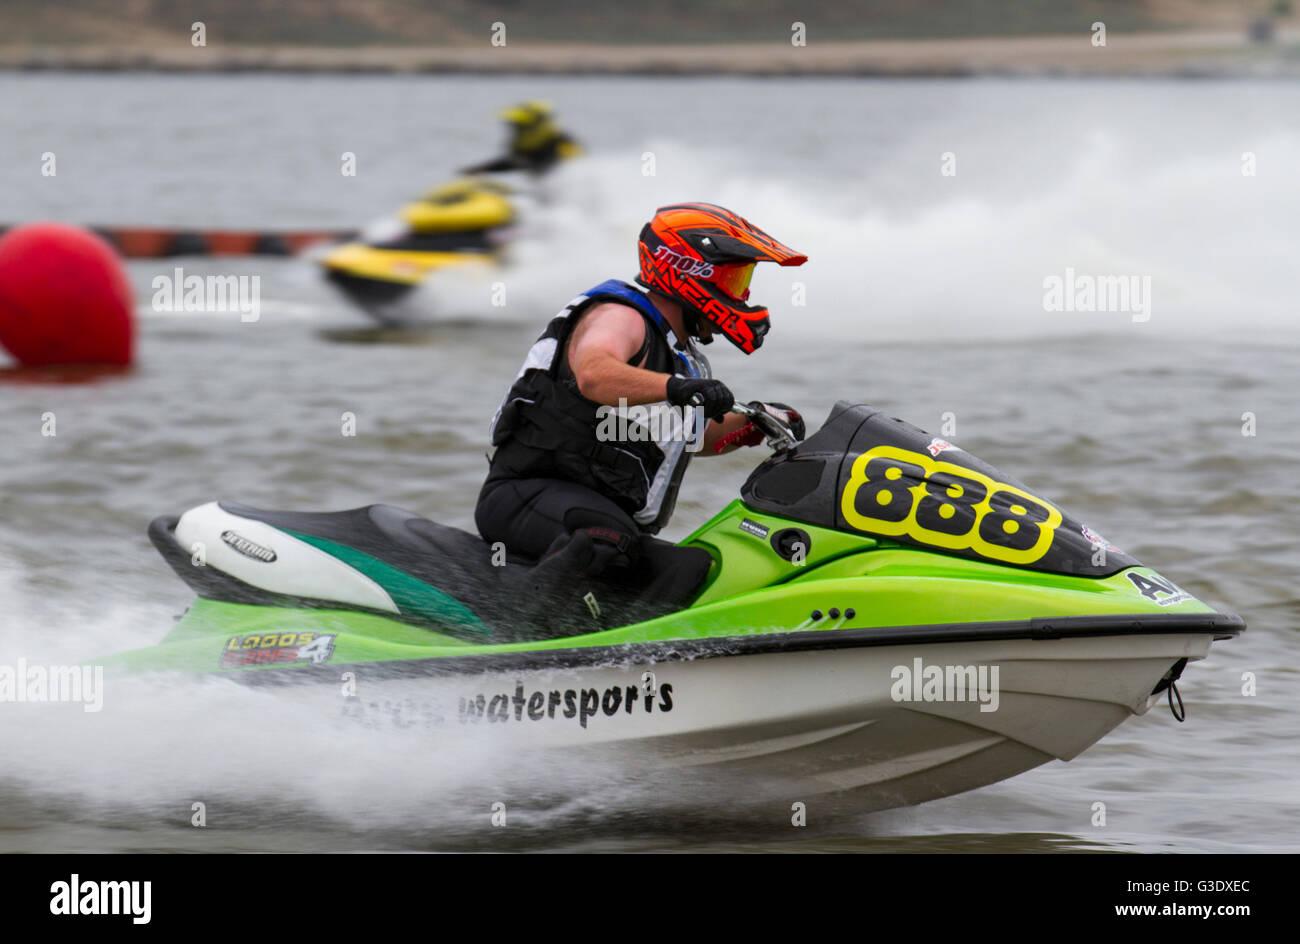 Steve Davis, Avos Waterspots at the British Summer Championships, Round 2 Crosby Lakeside Adventure Centre_Jet Ski - Stock Image